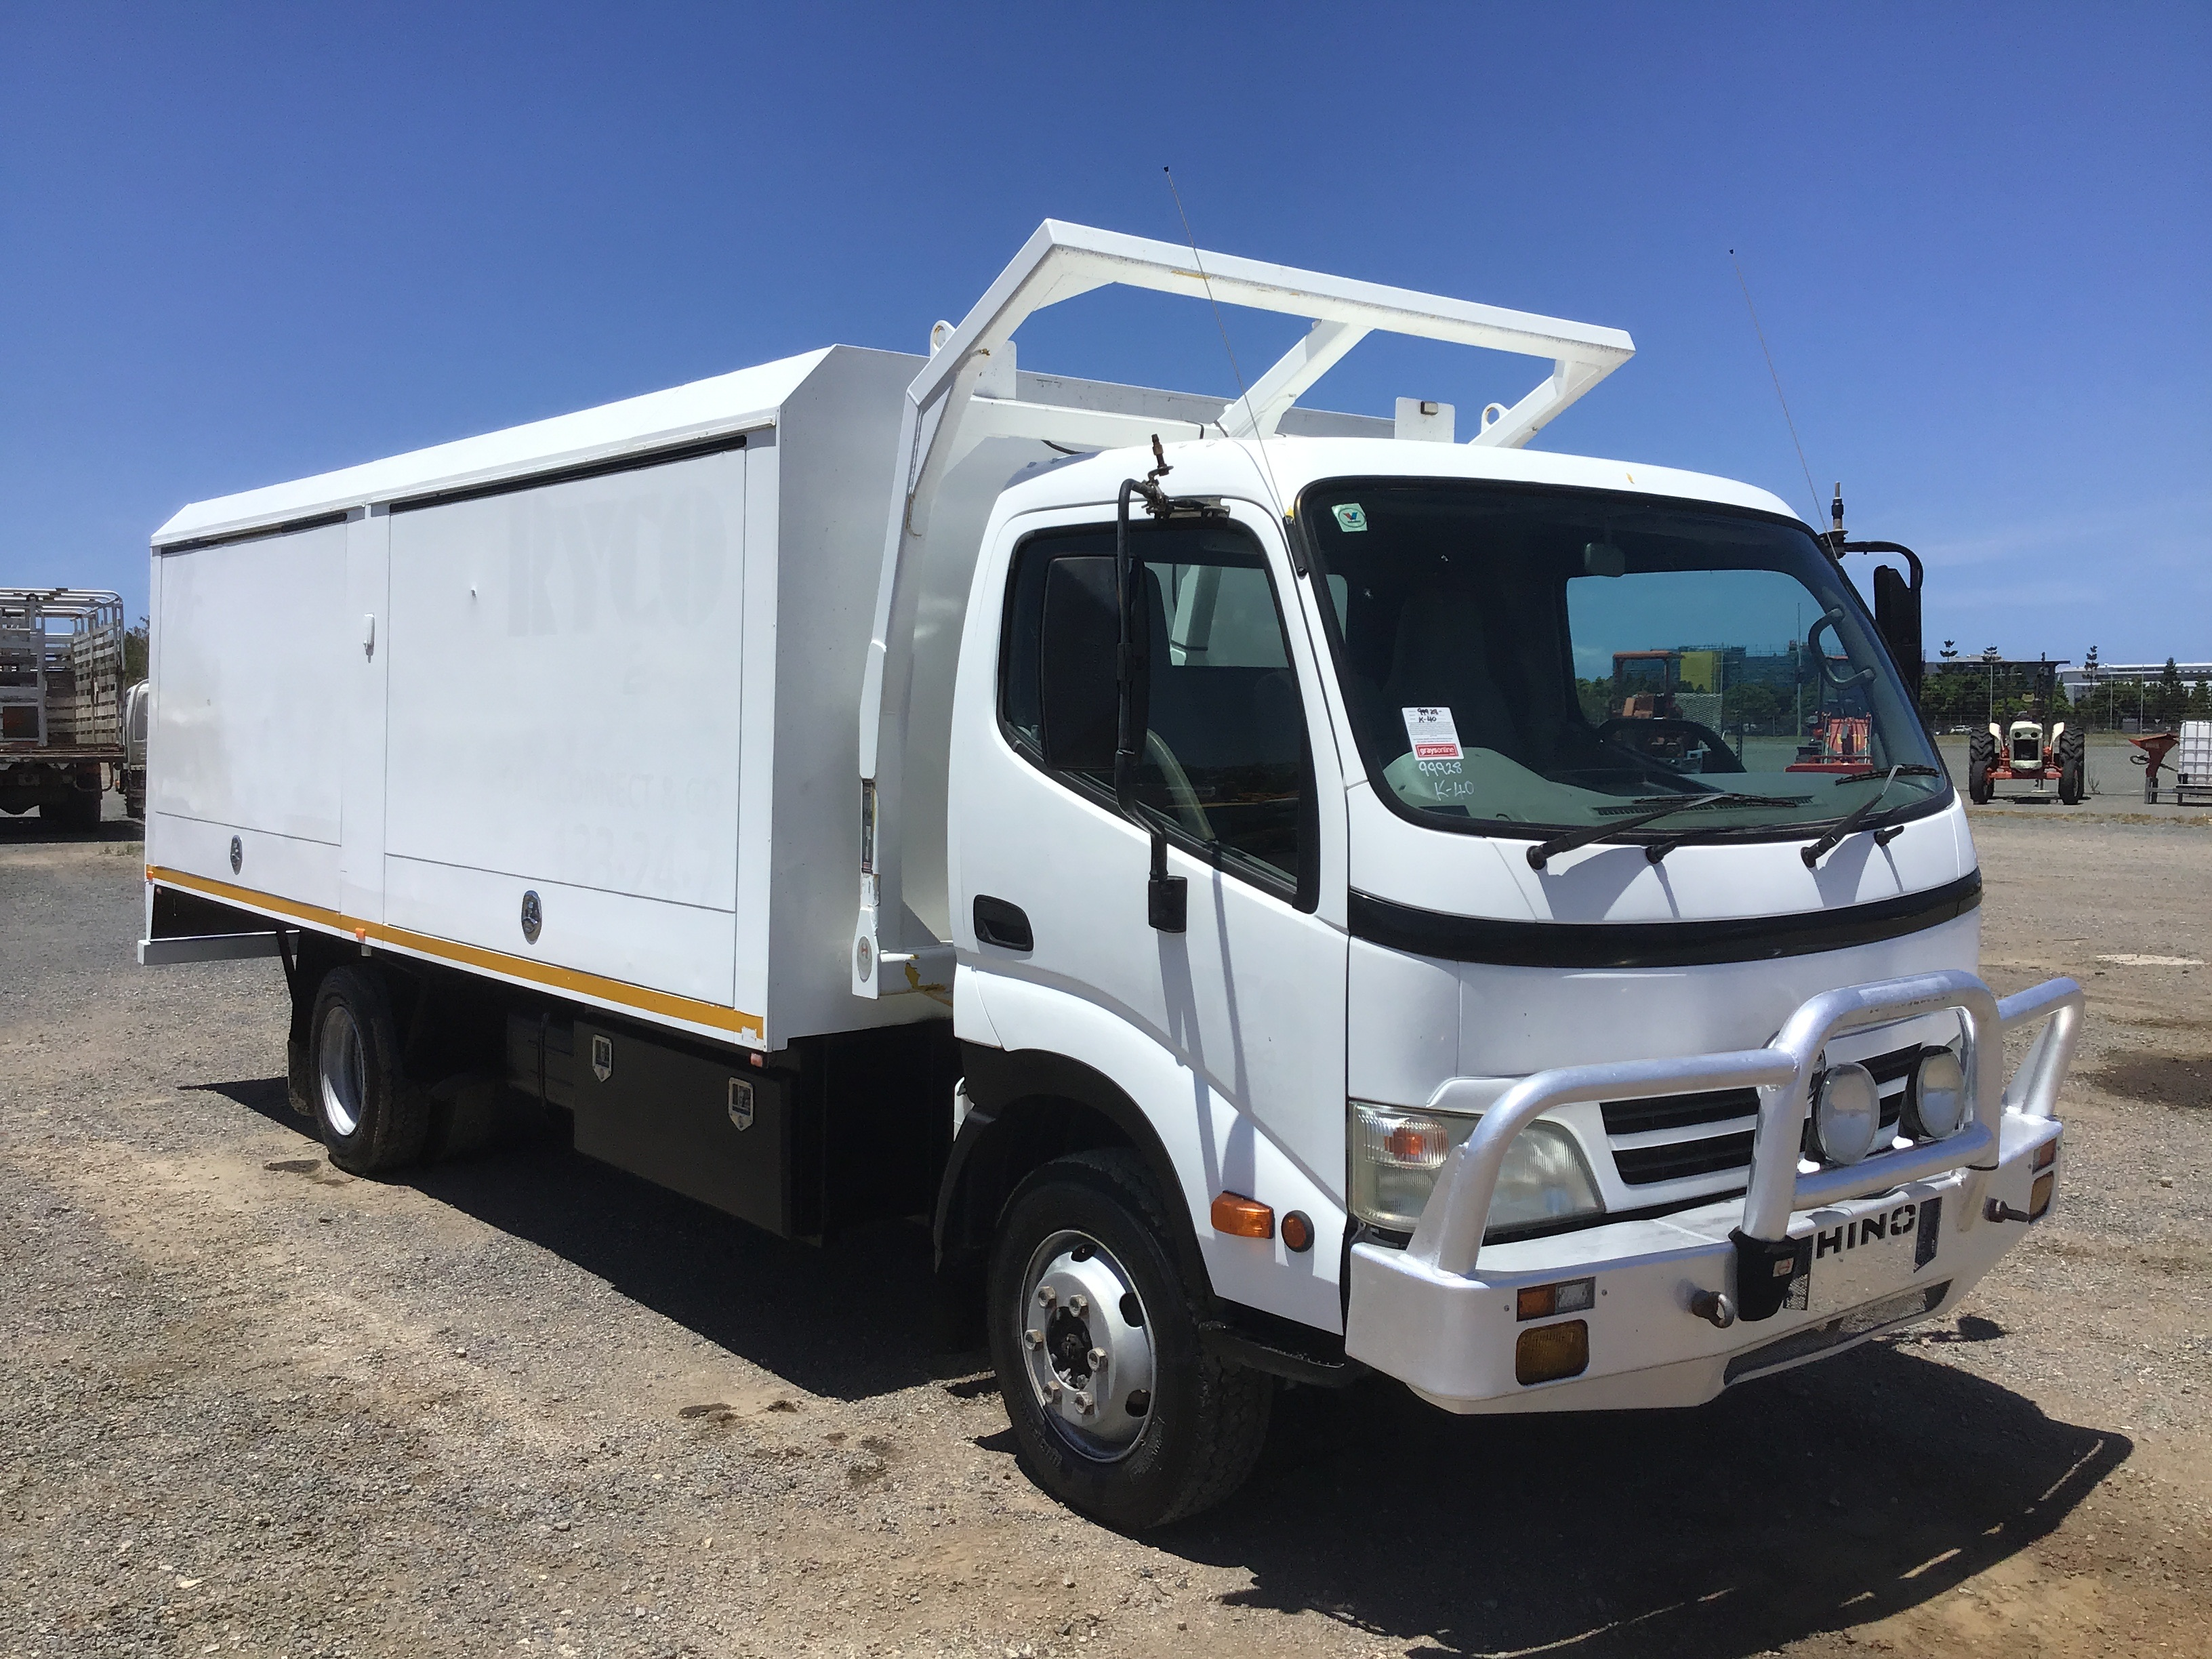 2008 Hino 300 4 x 2 Service Truck